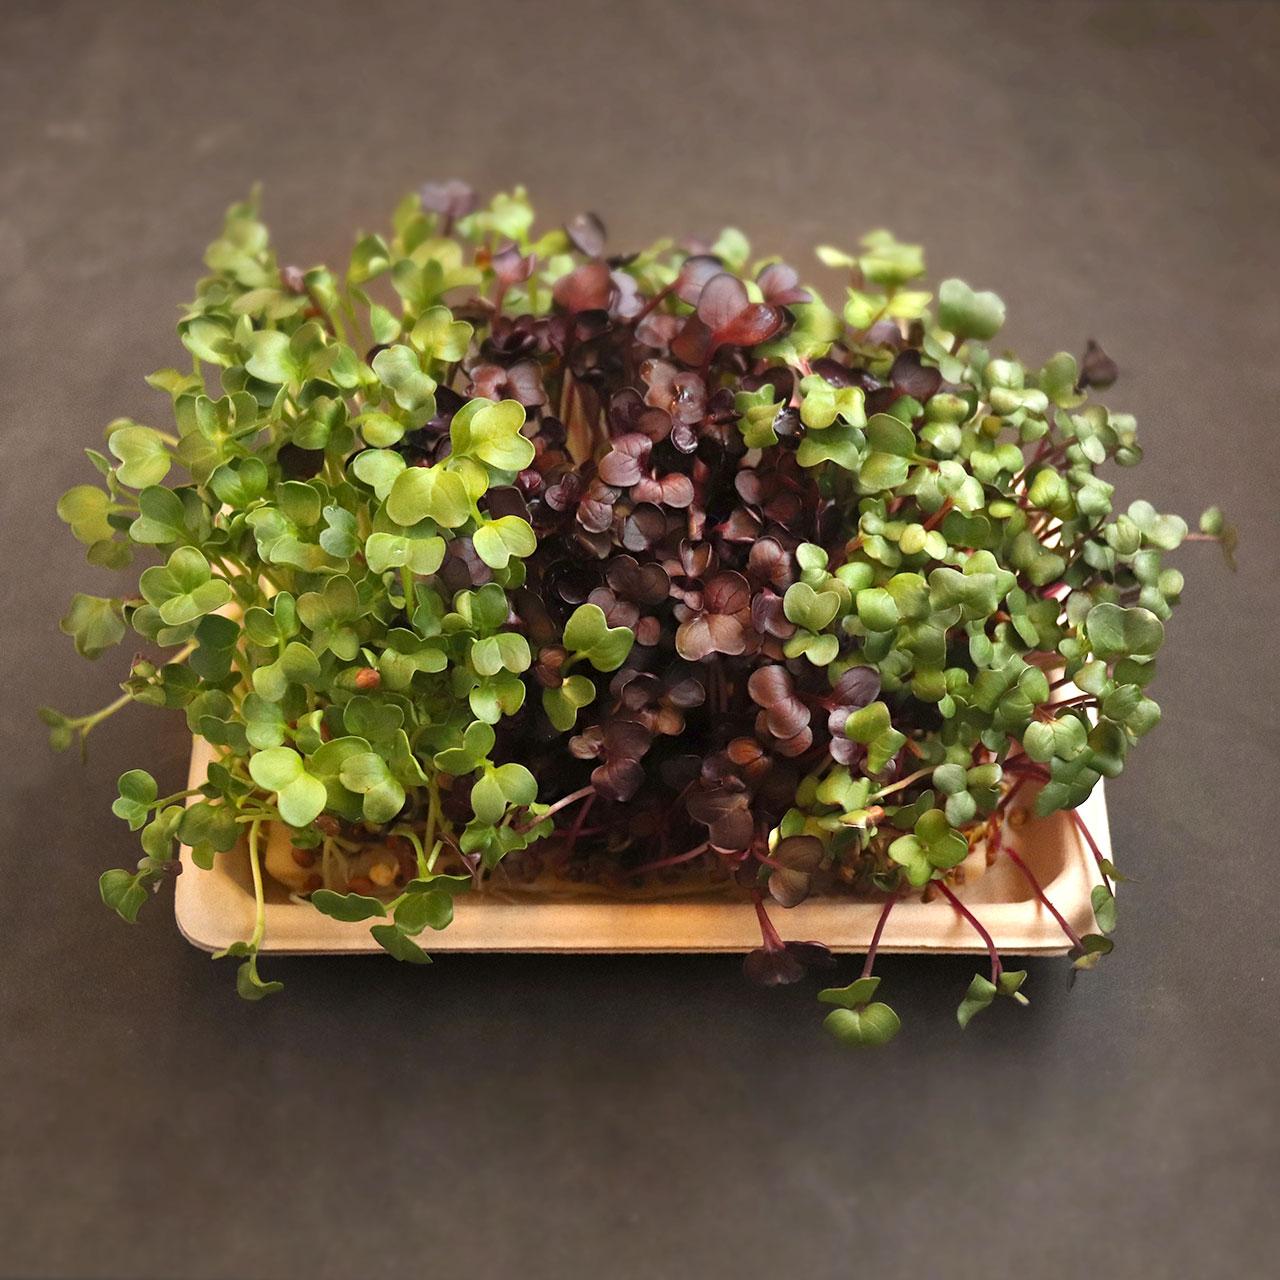 Home grow kit - fully grown microgreens